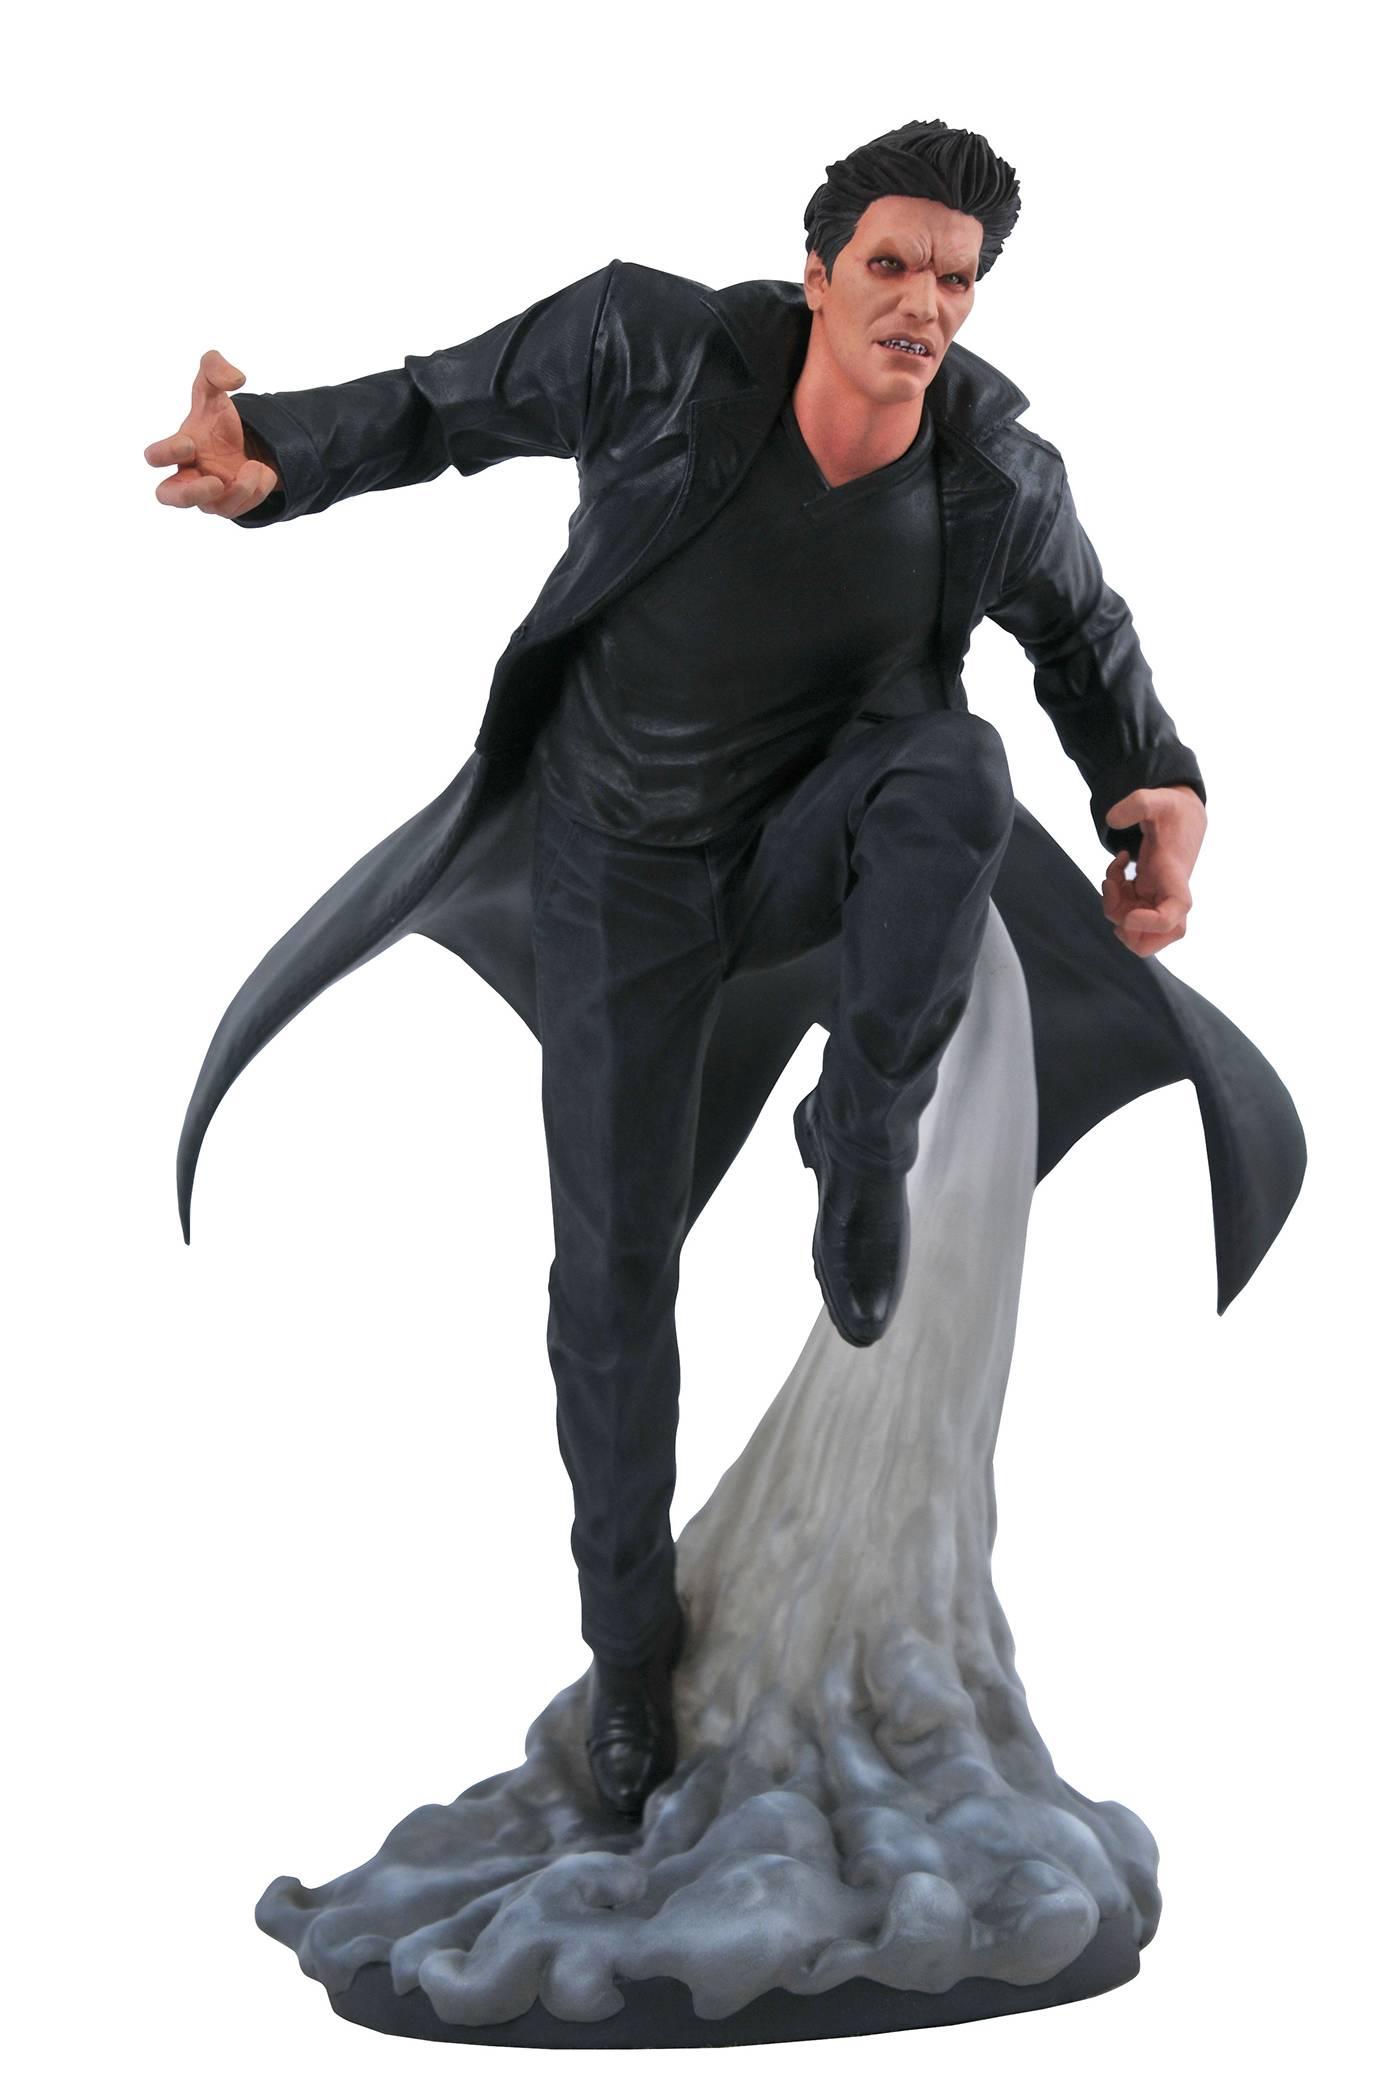 BUFFY THE VAMPIRE SLAYER GALLERY VAMPIRE ANGEL PVC STATUE